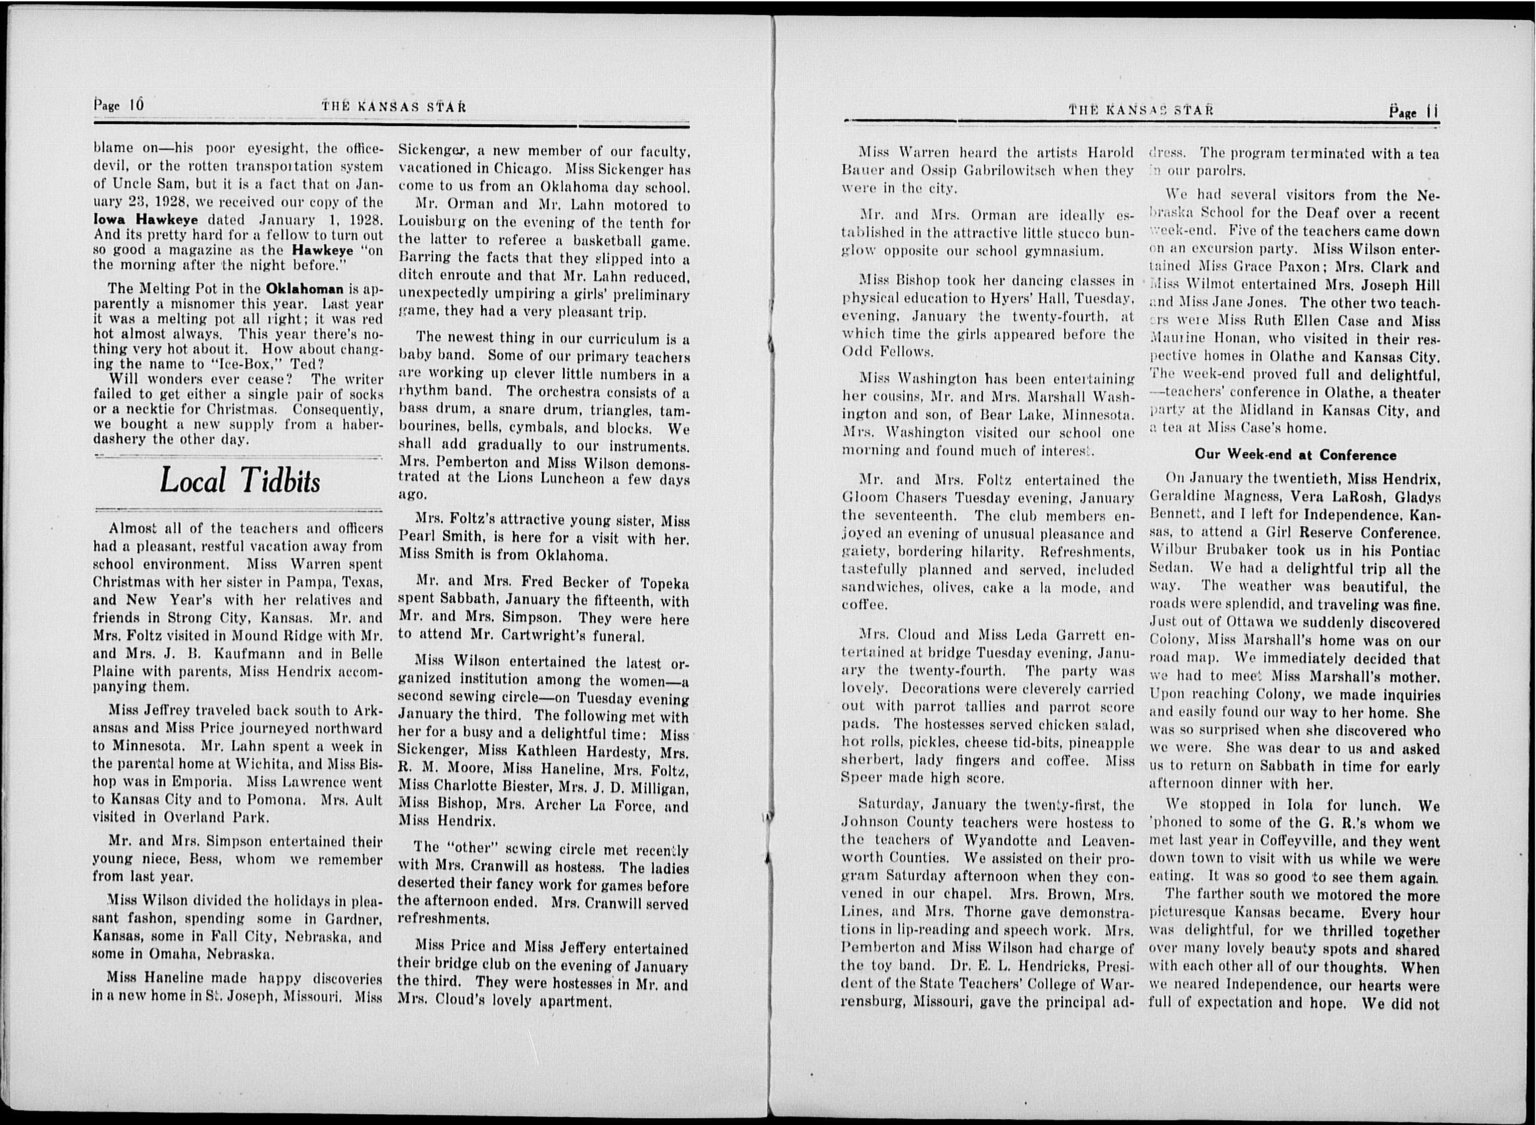 The Kansas Star, volume 51, number 6 - 10-11